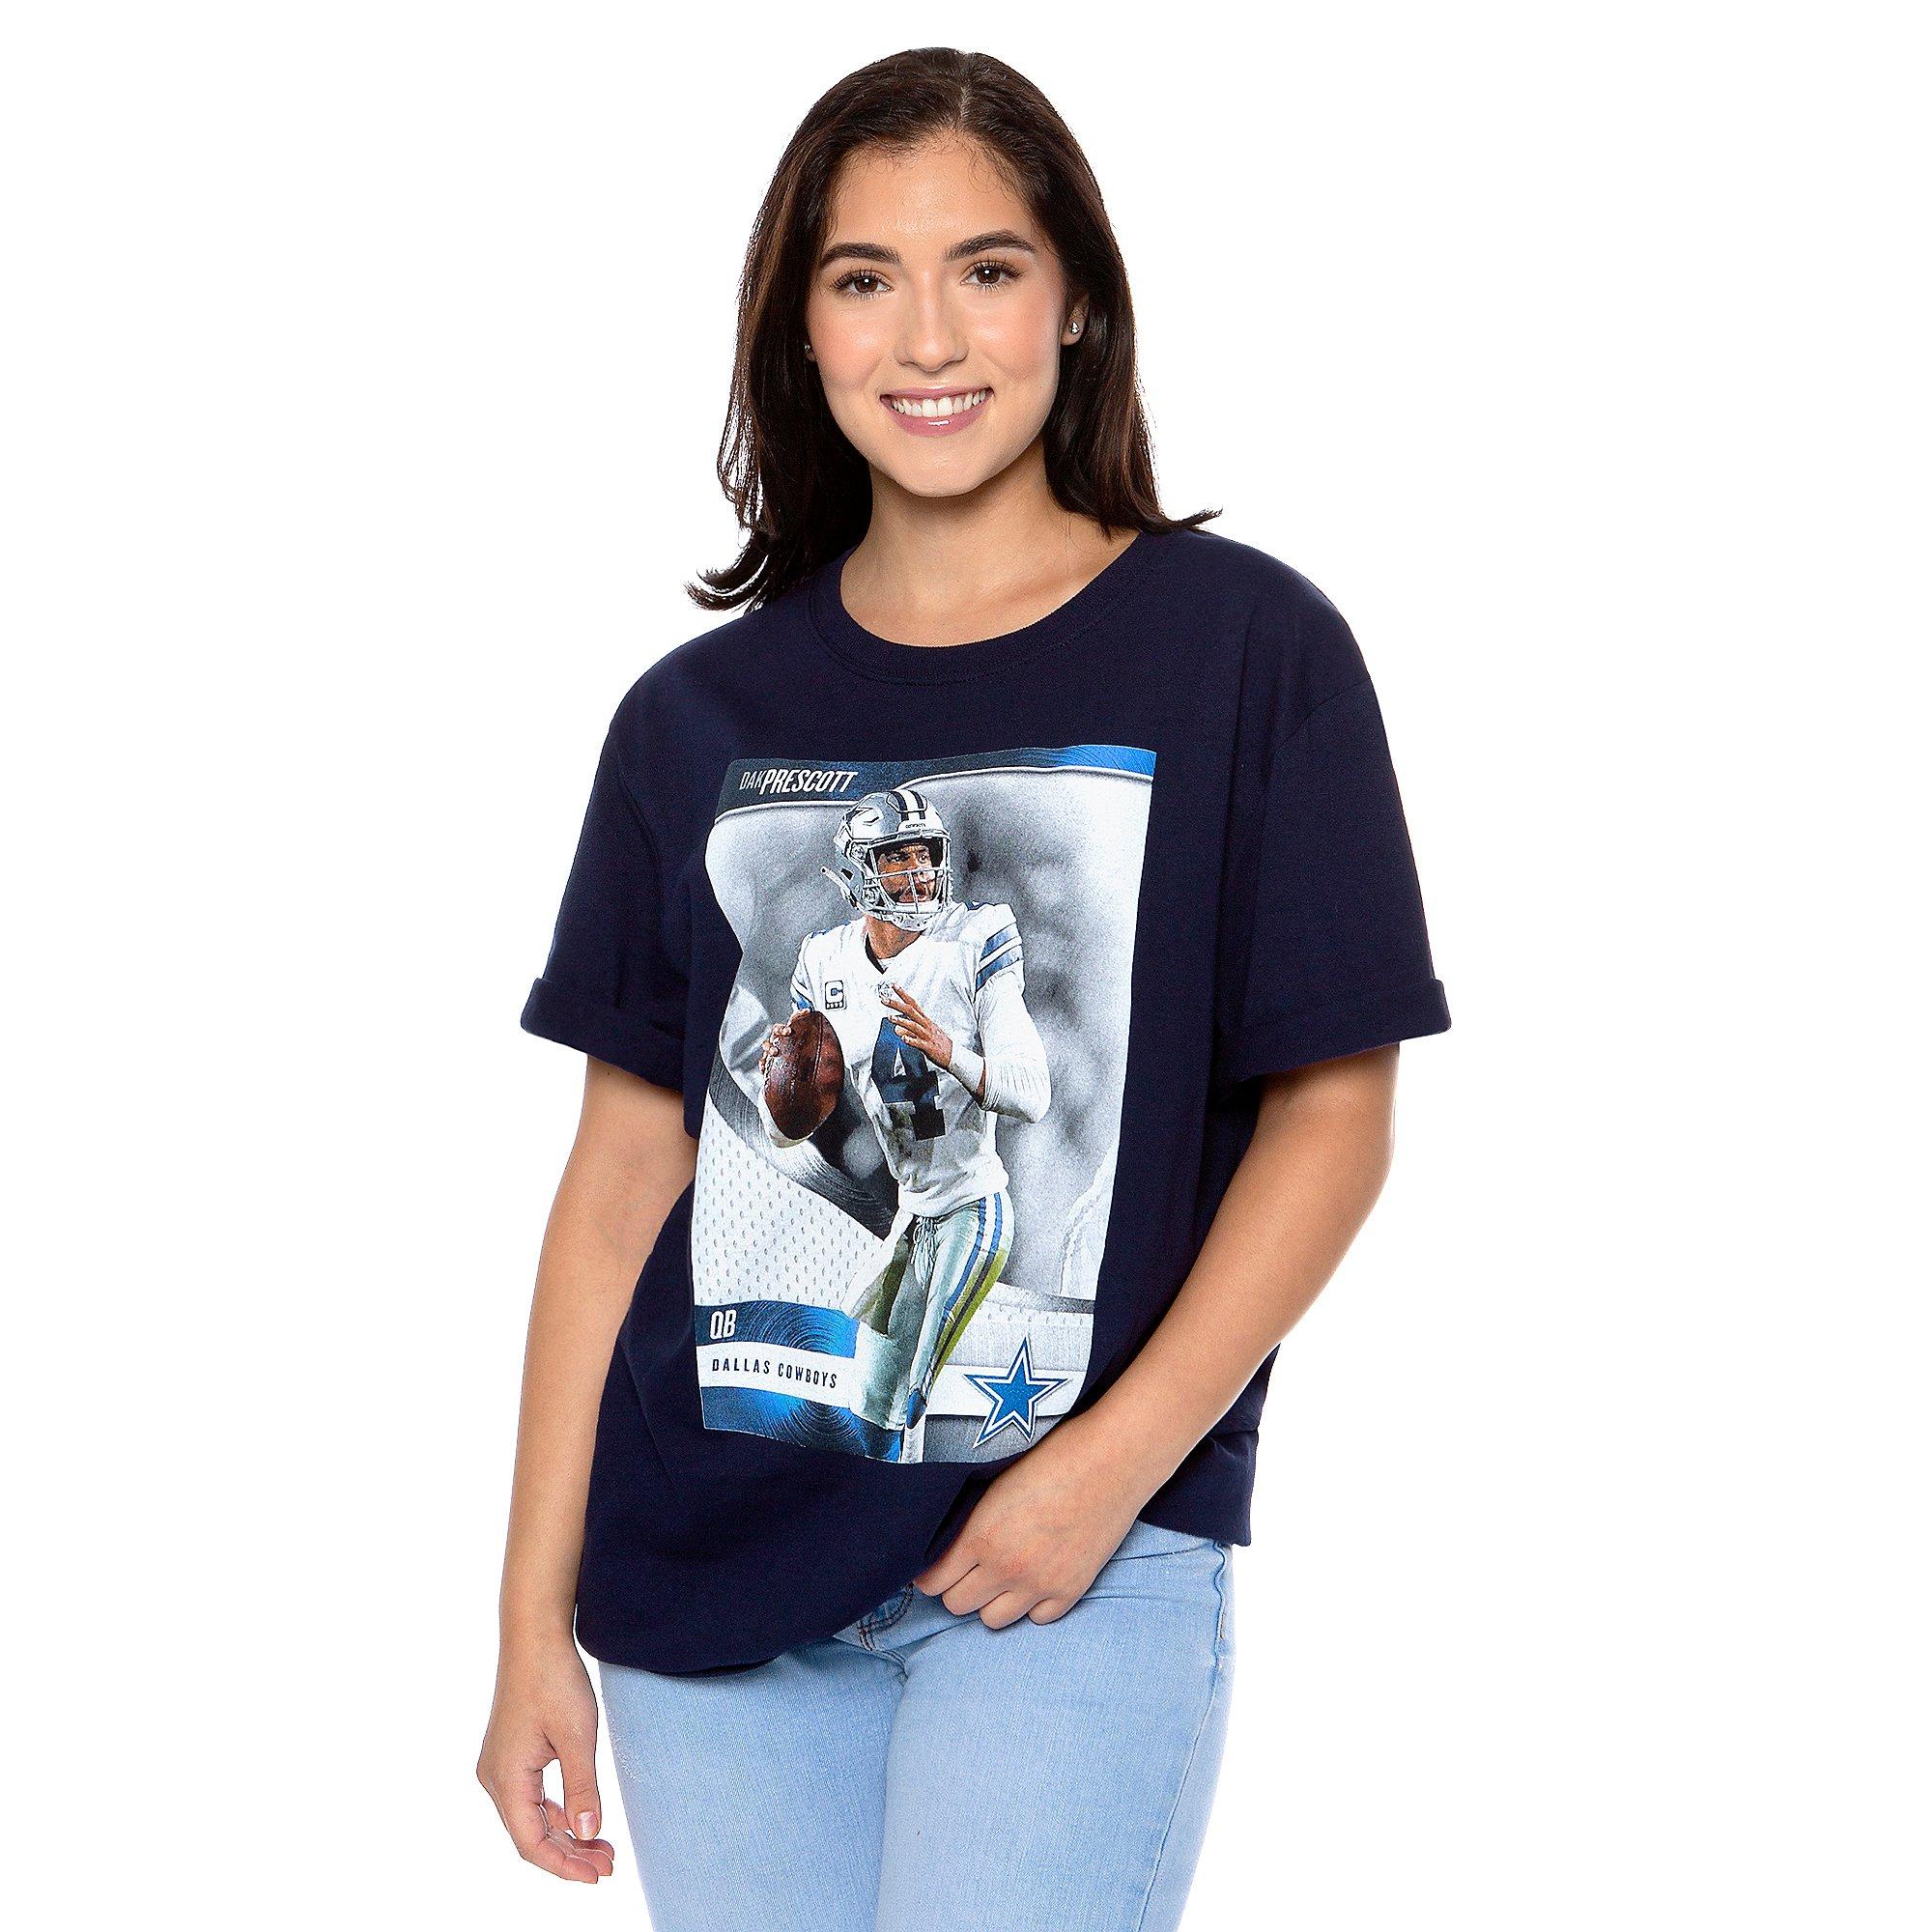 Dallas Cowboys America's Team Dak Prescott #4 T-Shirt